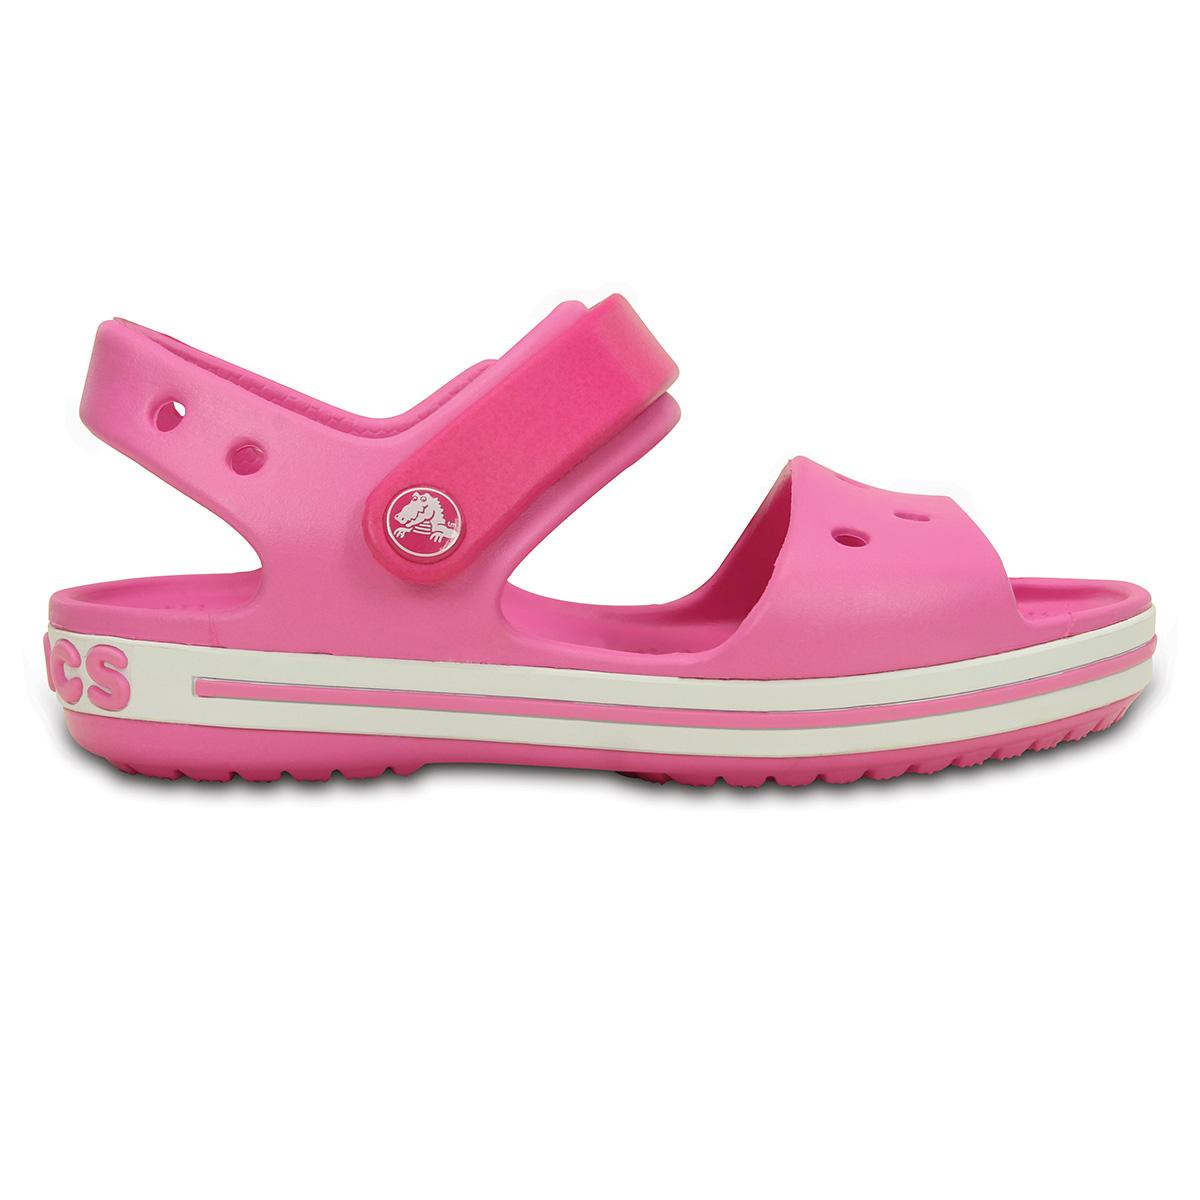 Crocs Crocband Sandal Kids - Şeker Pembesi/Parti Pembesi